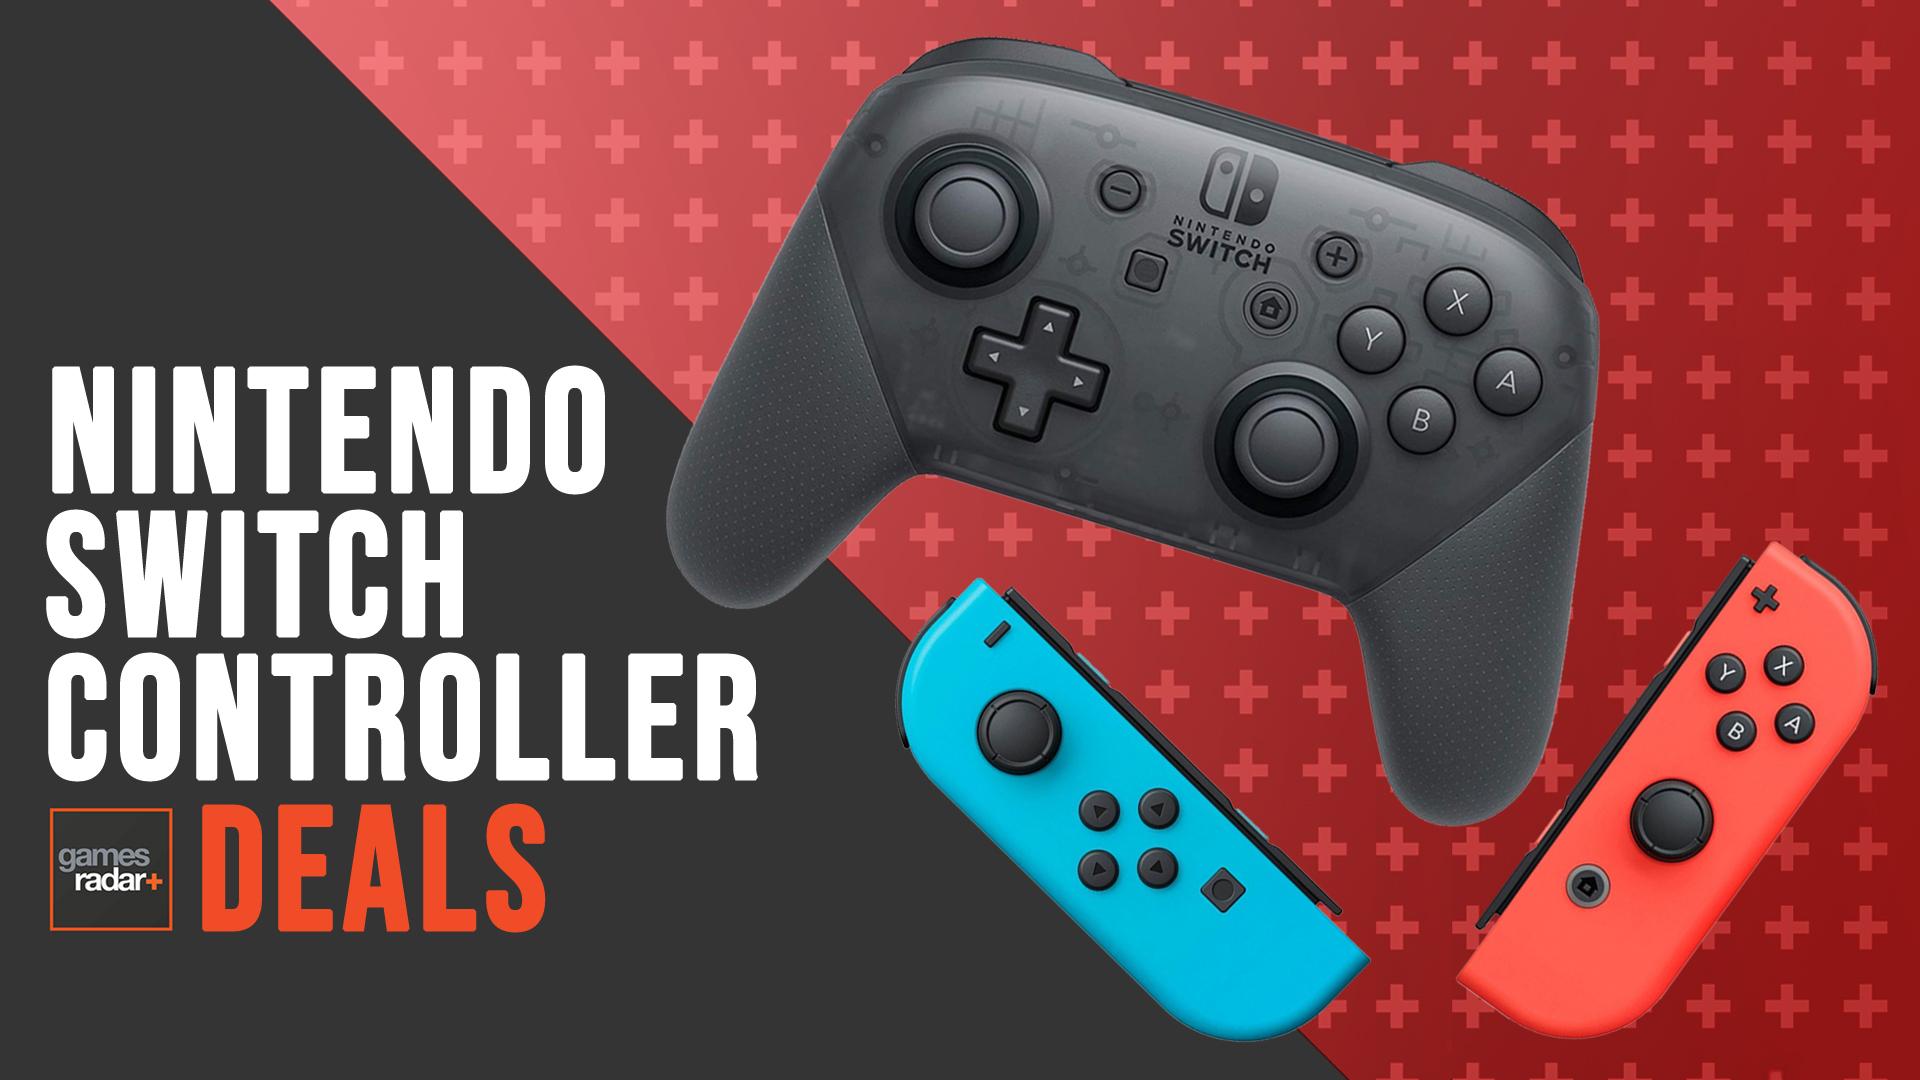 Cheap Nintendo Switch Controller Deals Offers On Joy Cons And Pro Models Gamesradar